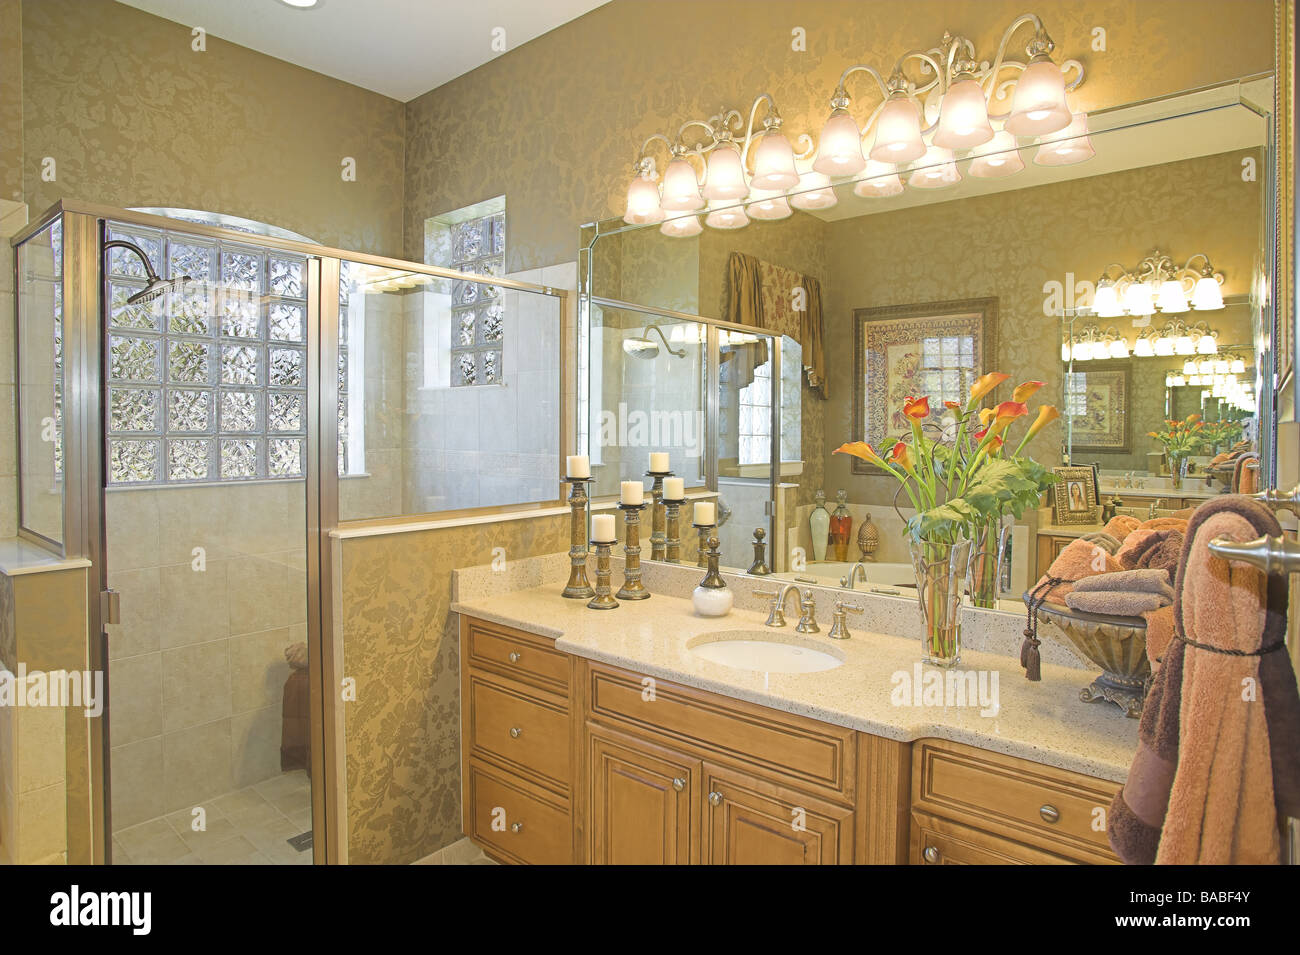 Modern home interiors. - Stock Image